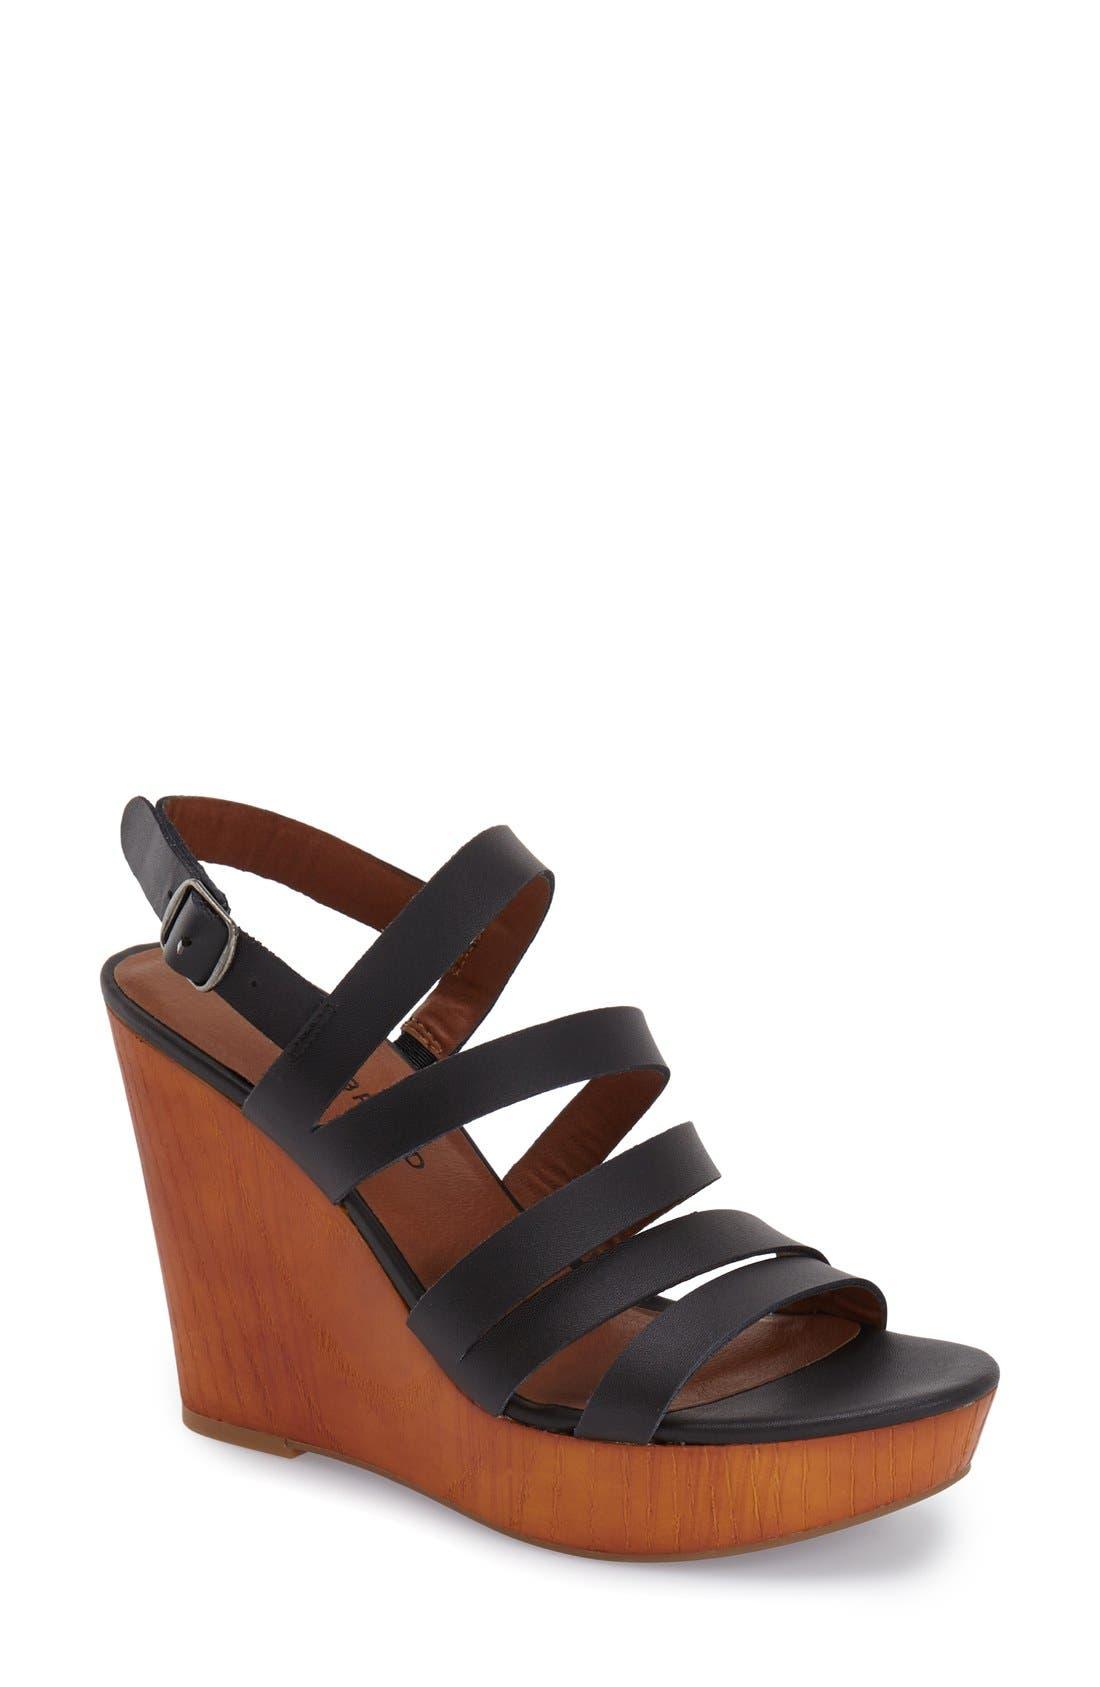 Alternate Image 1 Selected - Lucky Brand 'Larinaa' Wedge Sandal (Women)